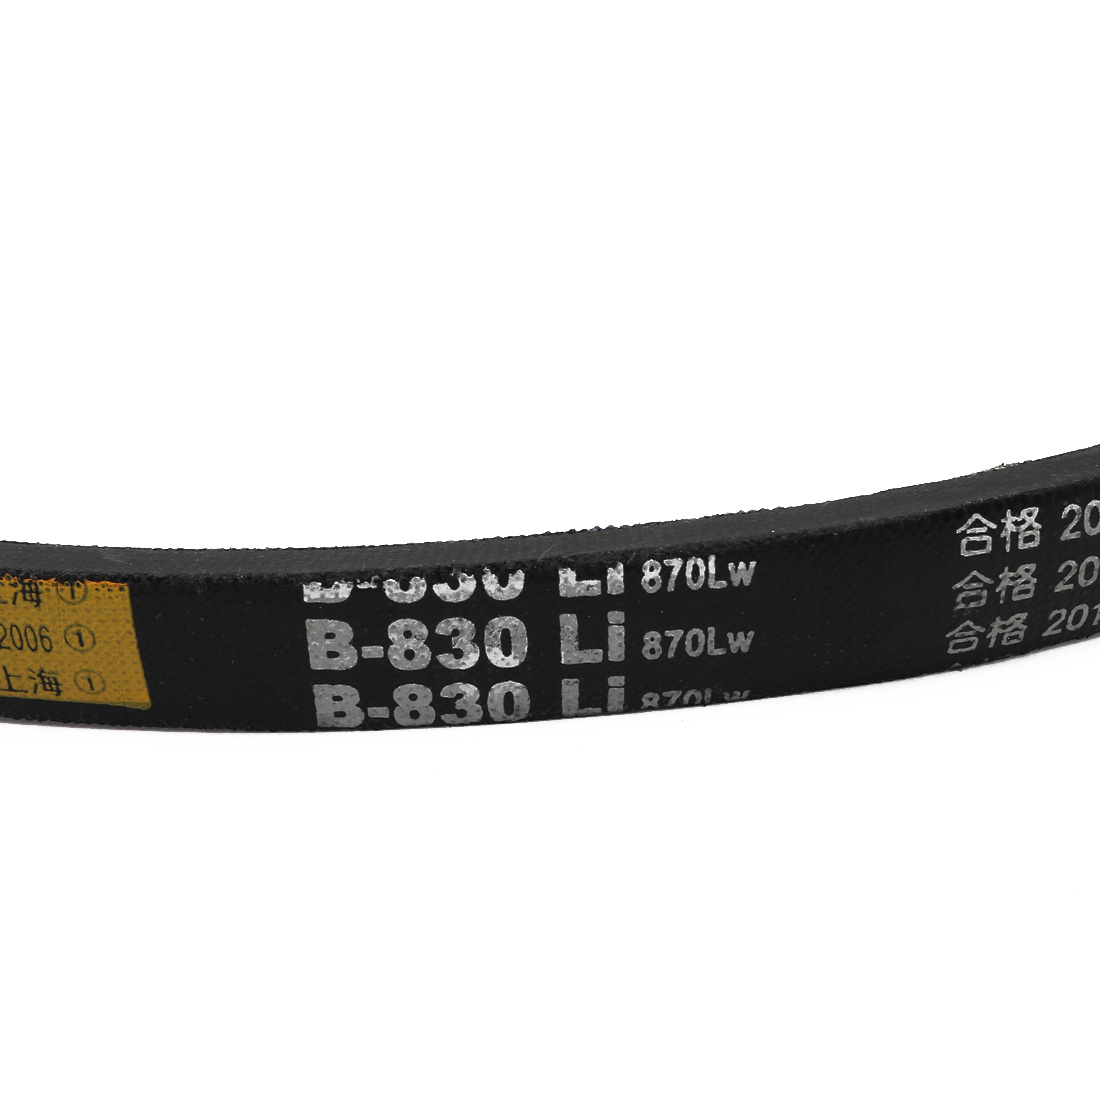 Unique Bargains B830 17mm Width 11mm Thickness Rubber Transmission Drive V-Belt - image 3 de 3